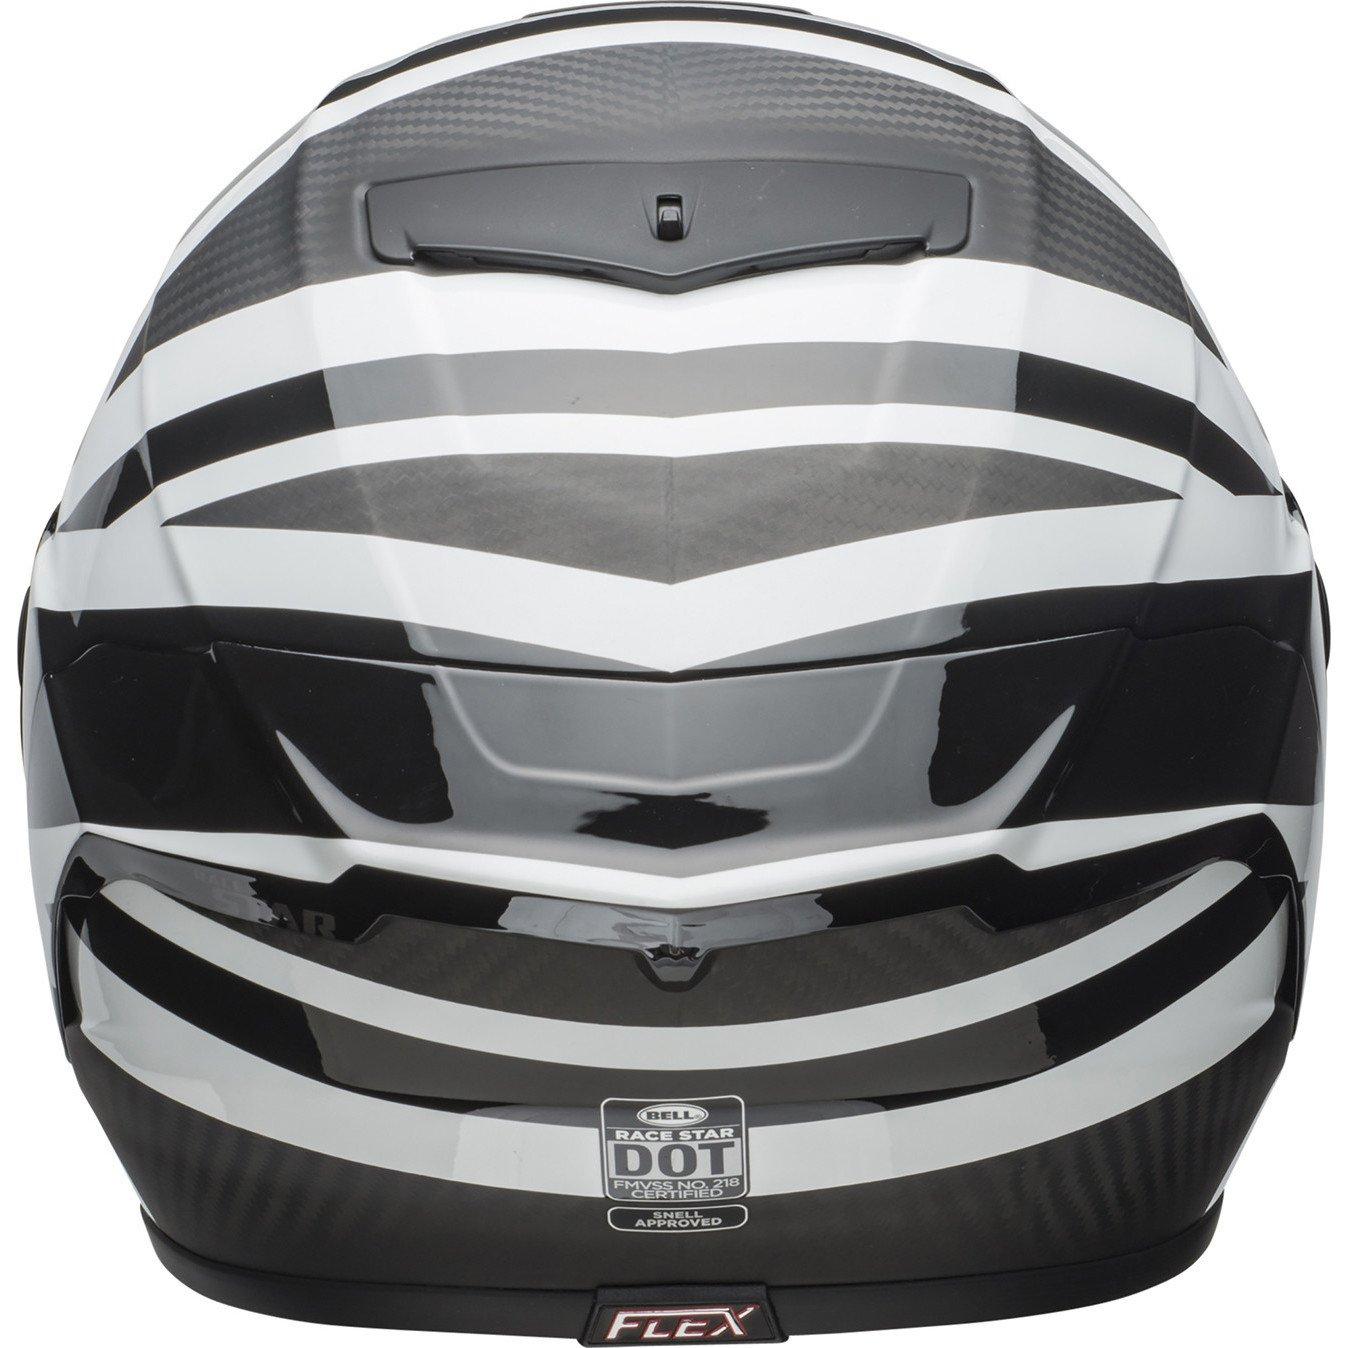 BELL Race Star Ace Cafe Blackjack Motorcycle Helmet